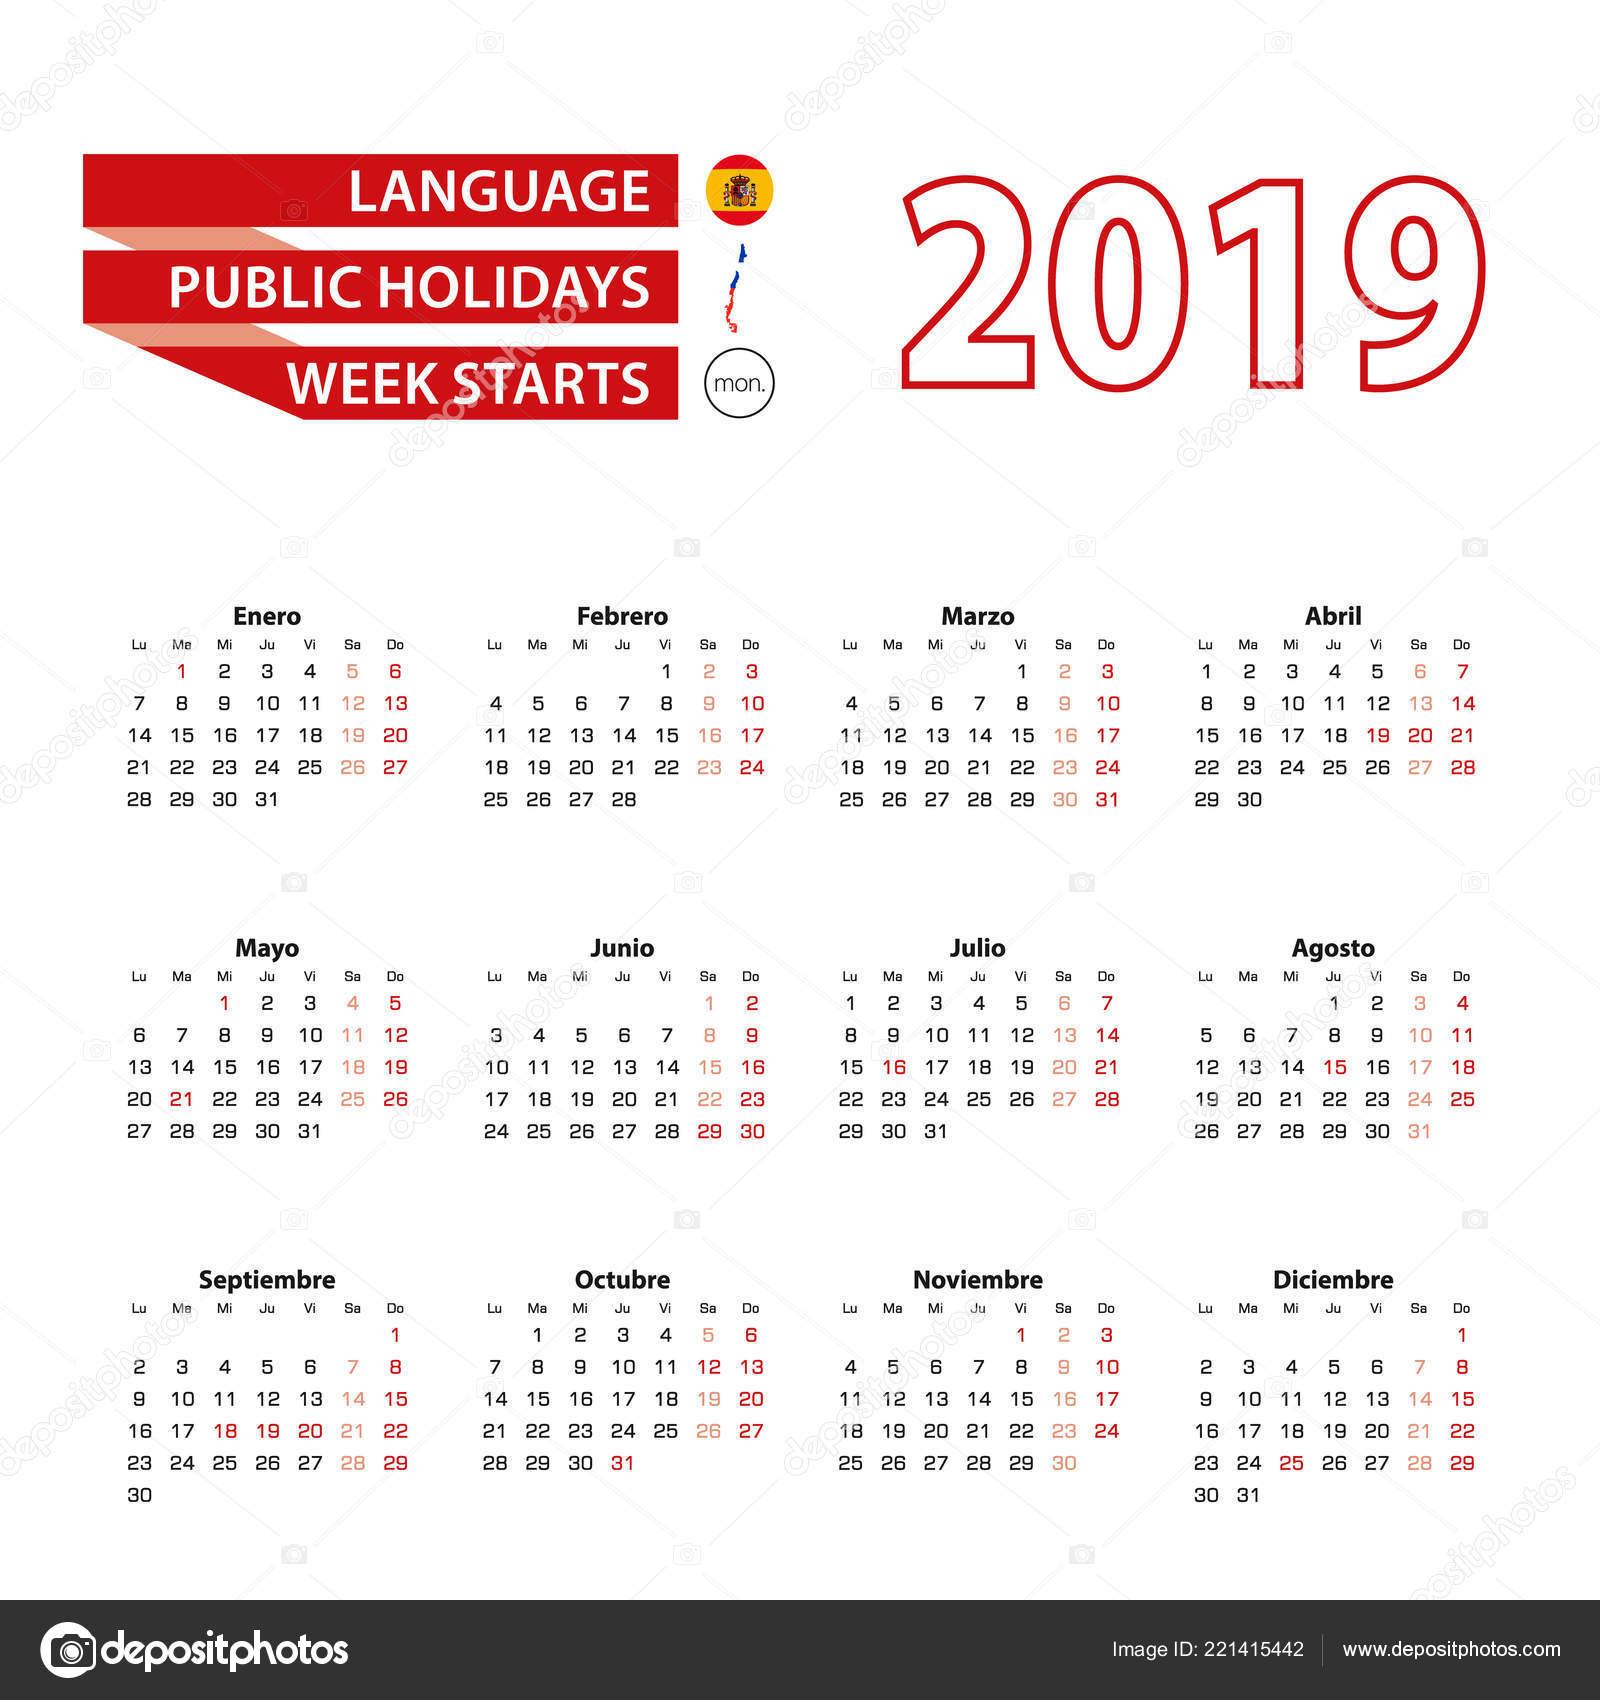 Calendario Chile 2019 Con Feriados.Calendar 2019 In Spanish Language With Public Holidays The